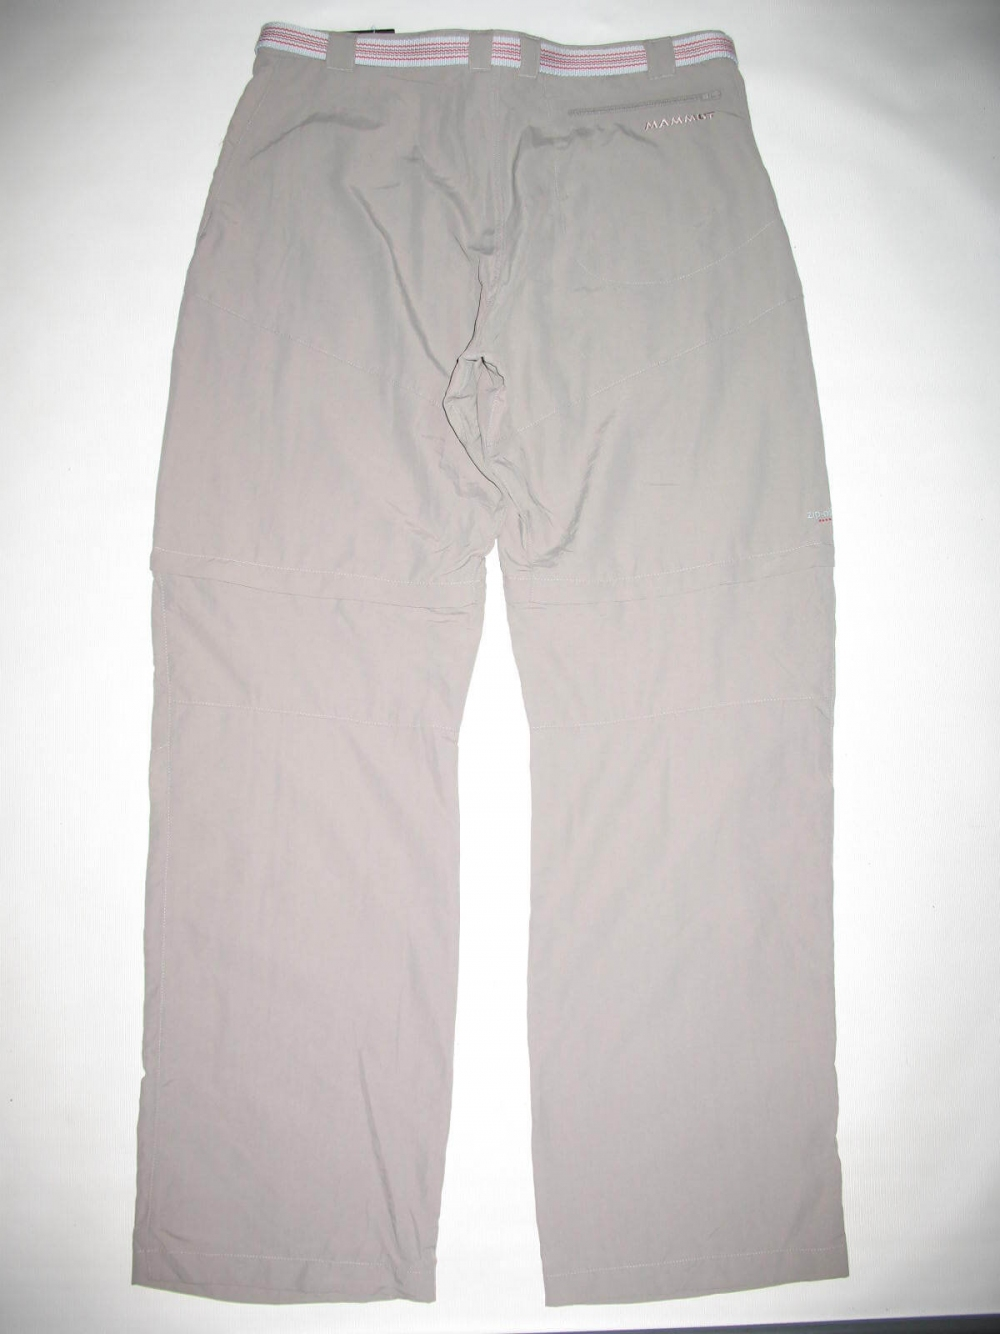 Штаны MAMMUT Zip off pants (размер 52-L/XL) - 1